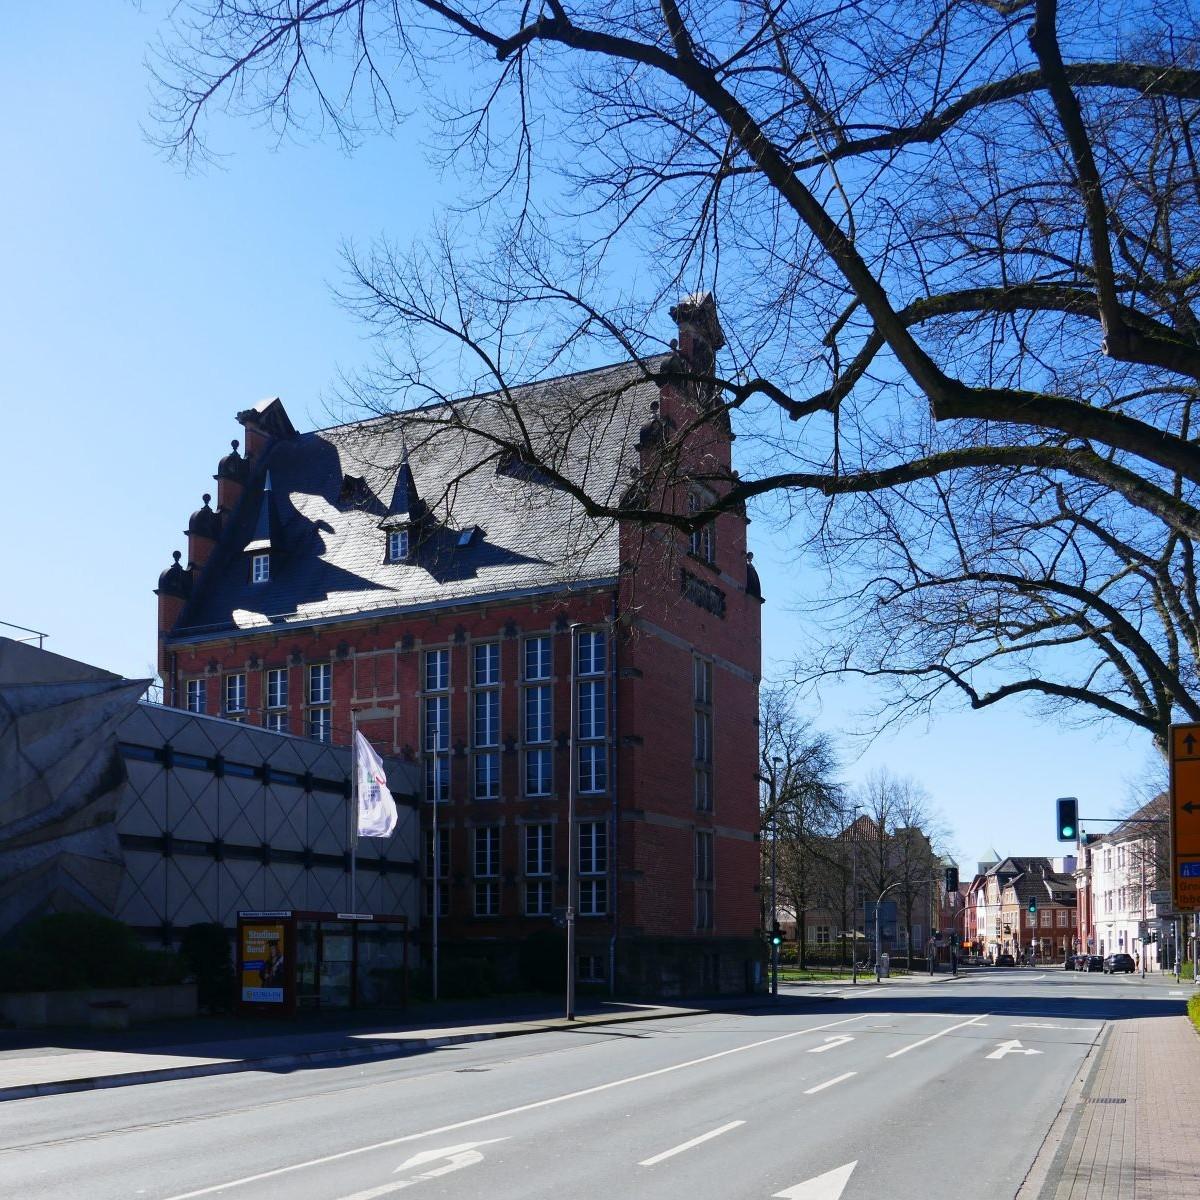 Münster vor Ort: Hörstertor - Foto: Stefan Rethfeld